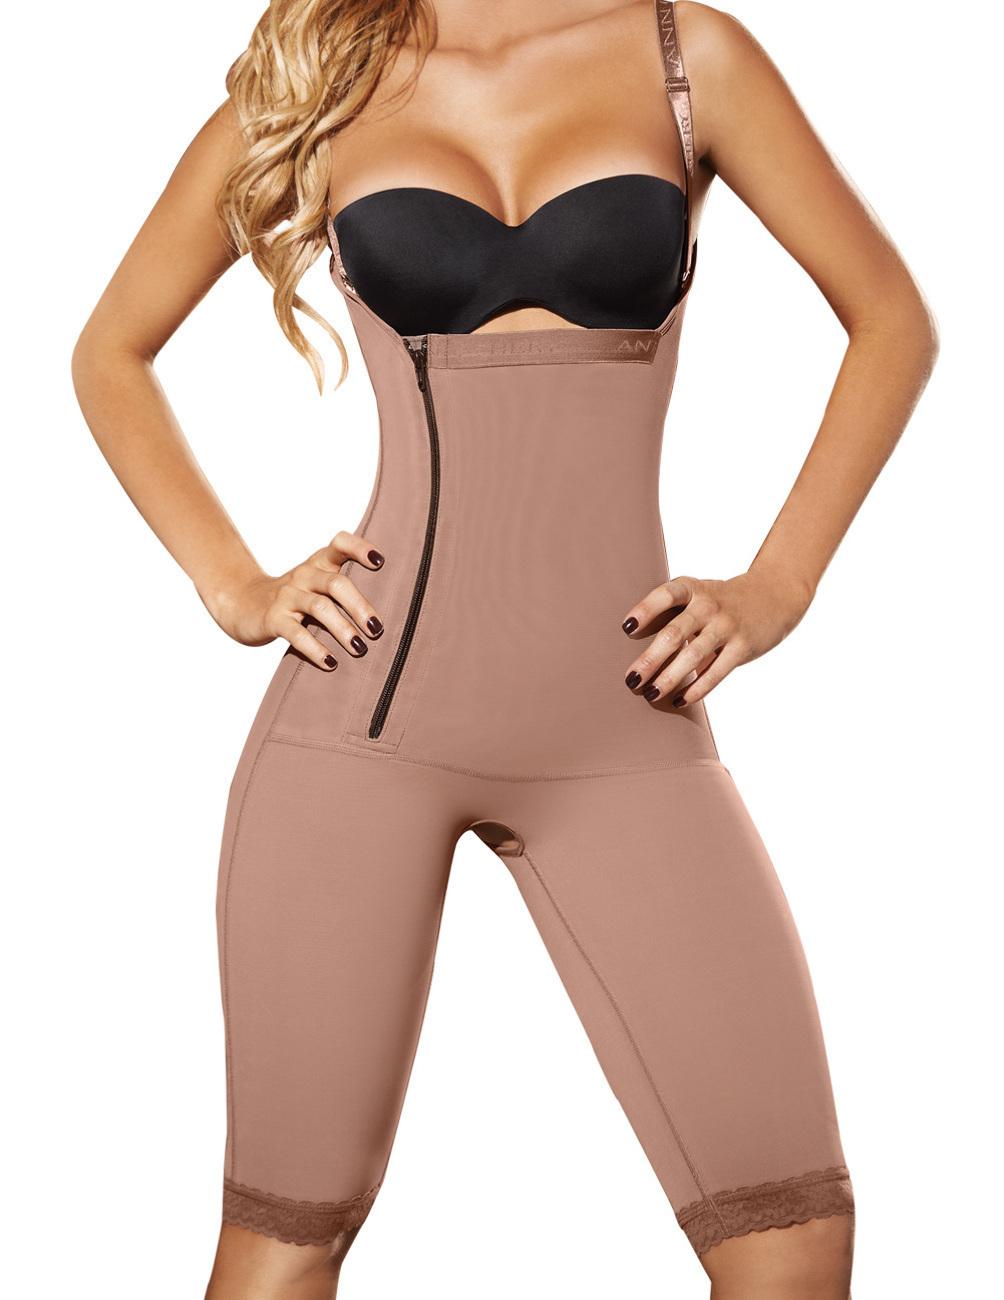 3331c1a2cf Ann Chery 5121 BRIGITTE Post Surgical Surgery Operatory Liposuction  Postpartum Body Shaper Compression Garment Girdle Post-Op X-LARGE -  Walmart.com